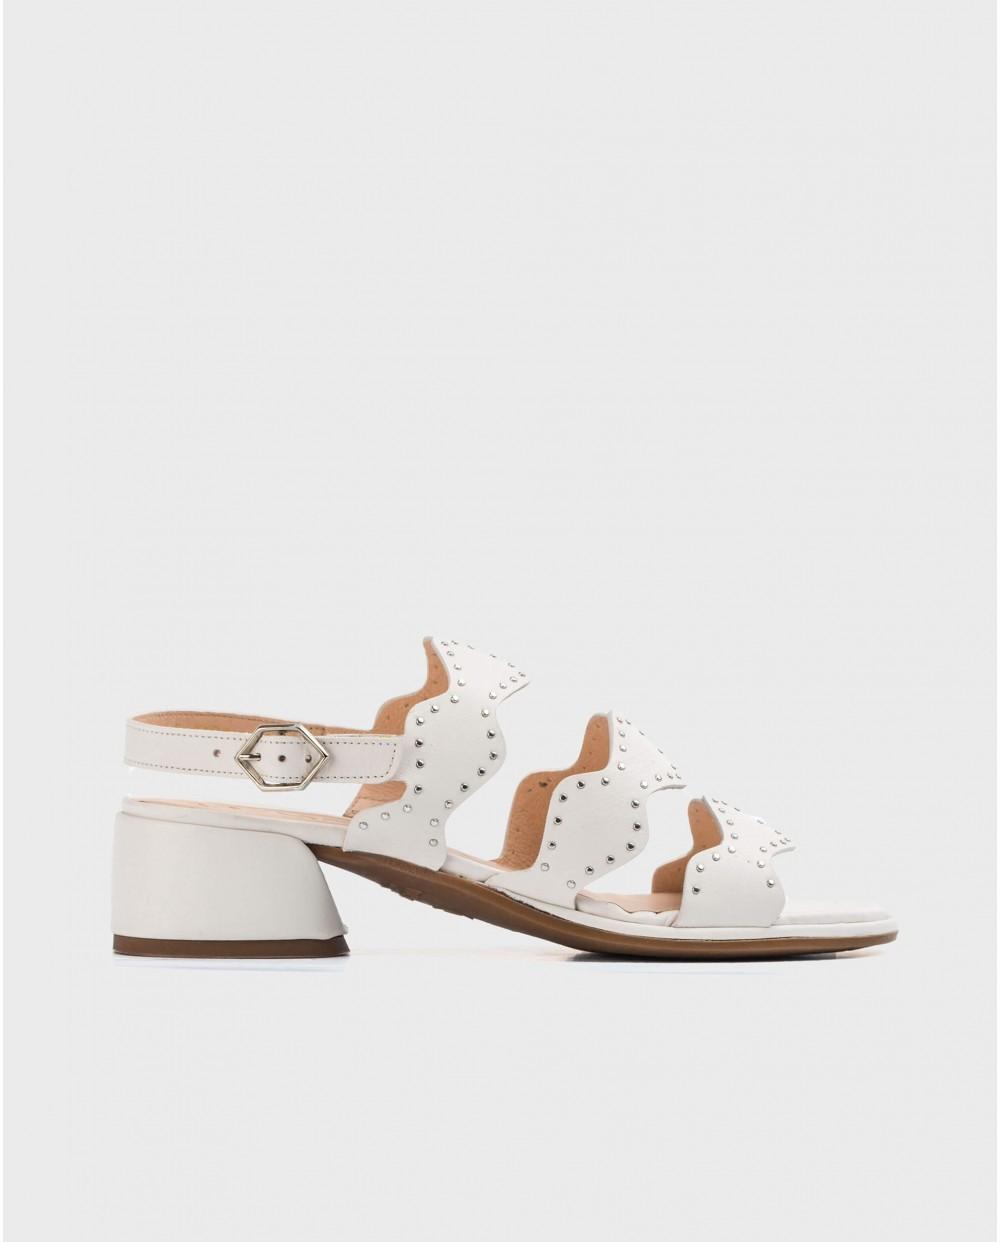 Wonders-Sandals-Sandals with rhinestone detail